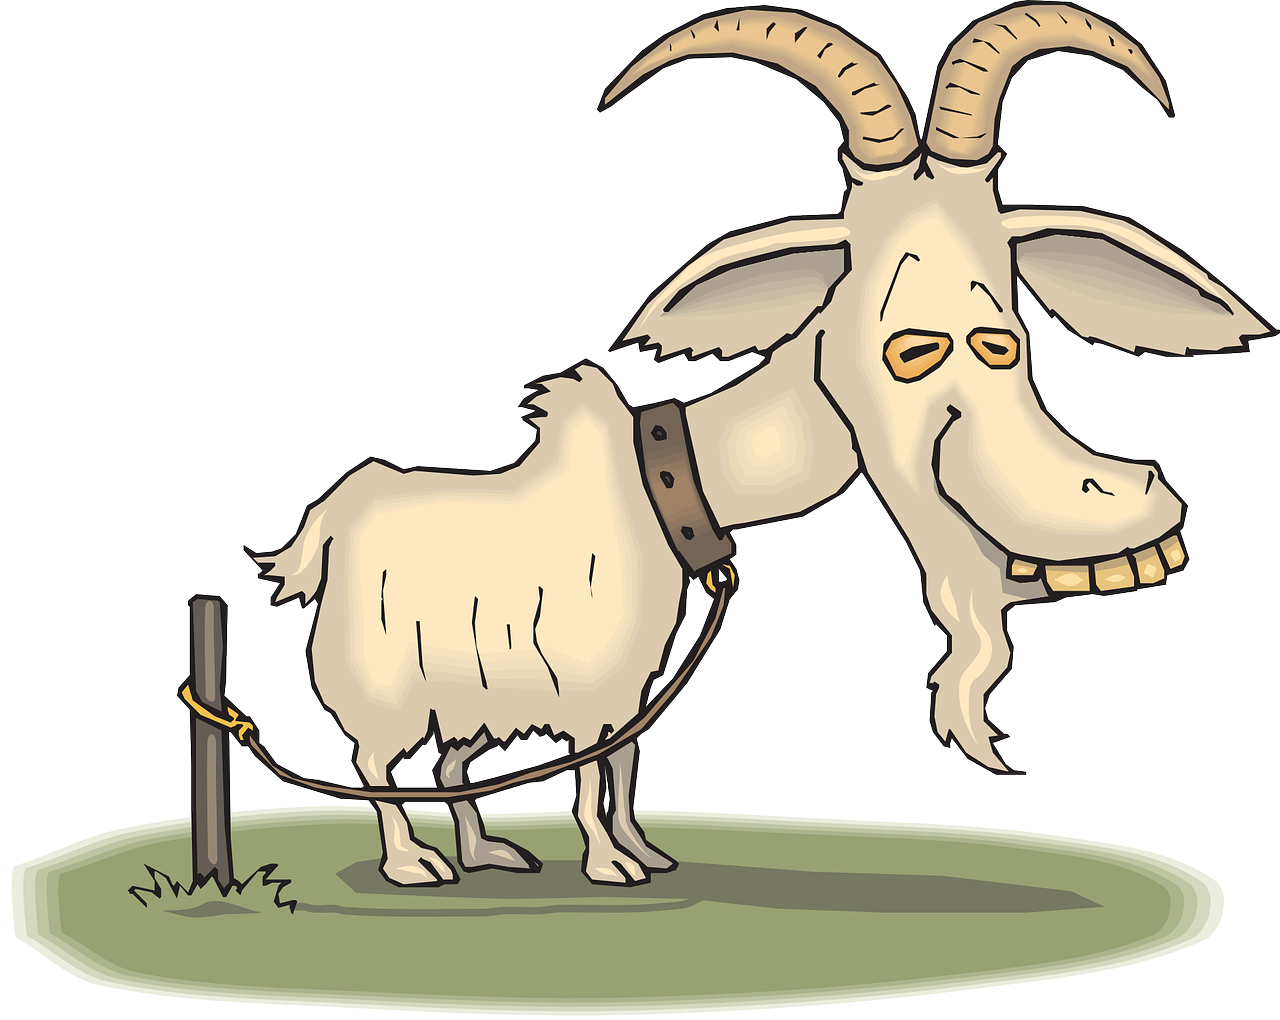 Cute clip art images. Goat clipart old goat